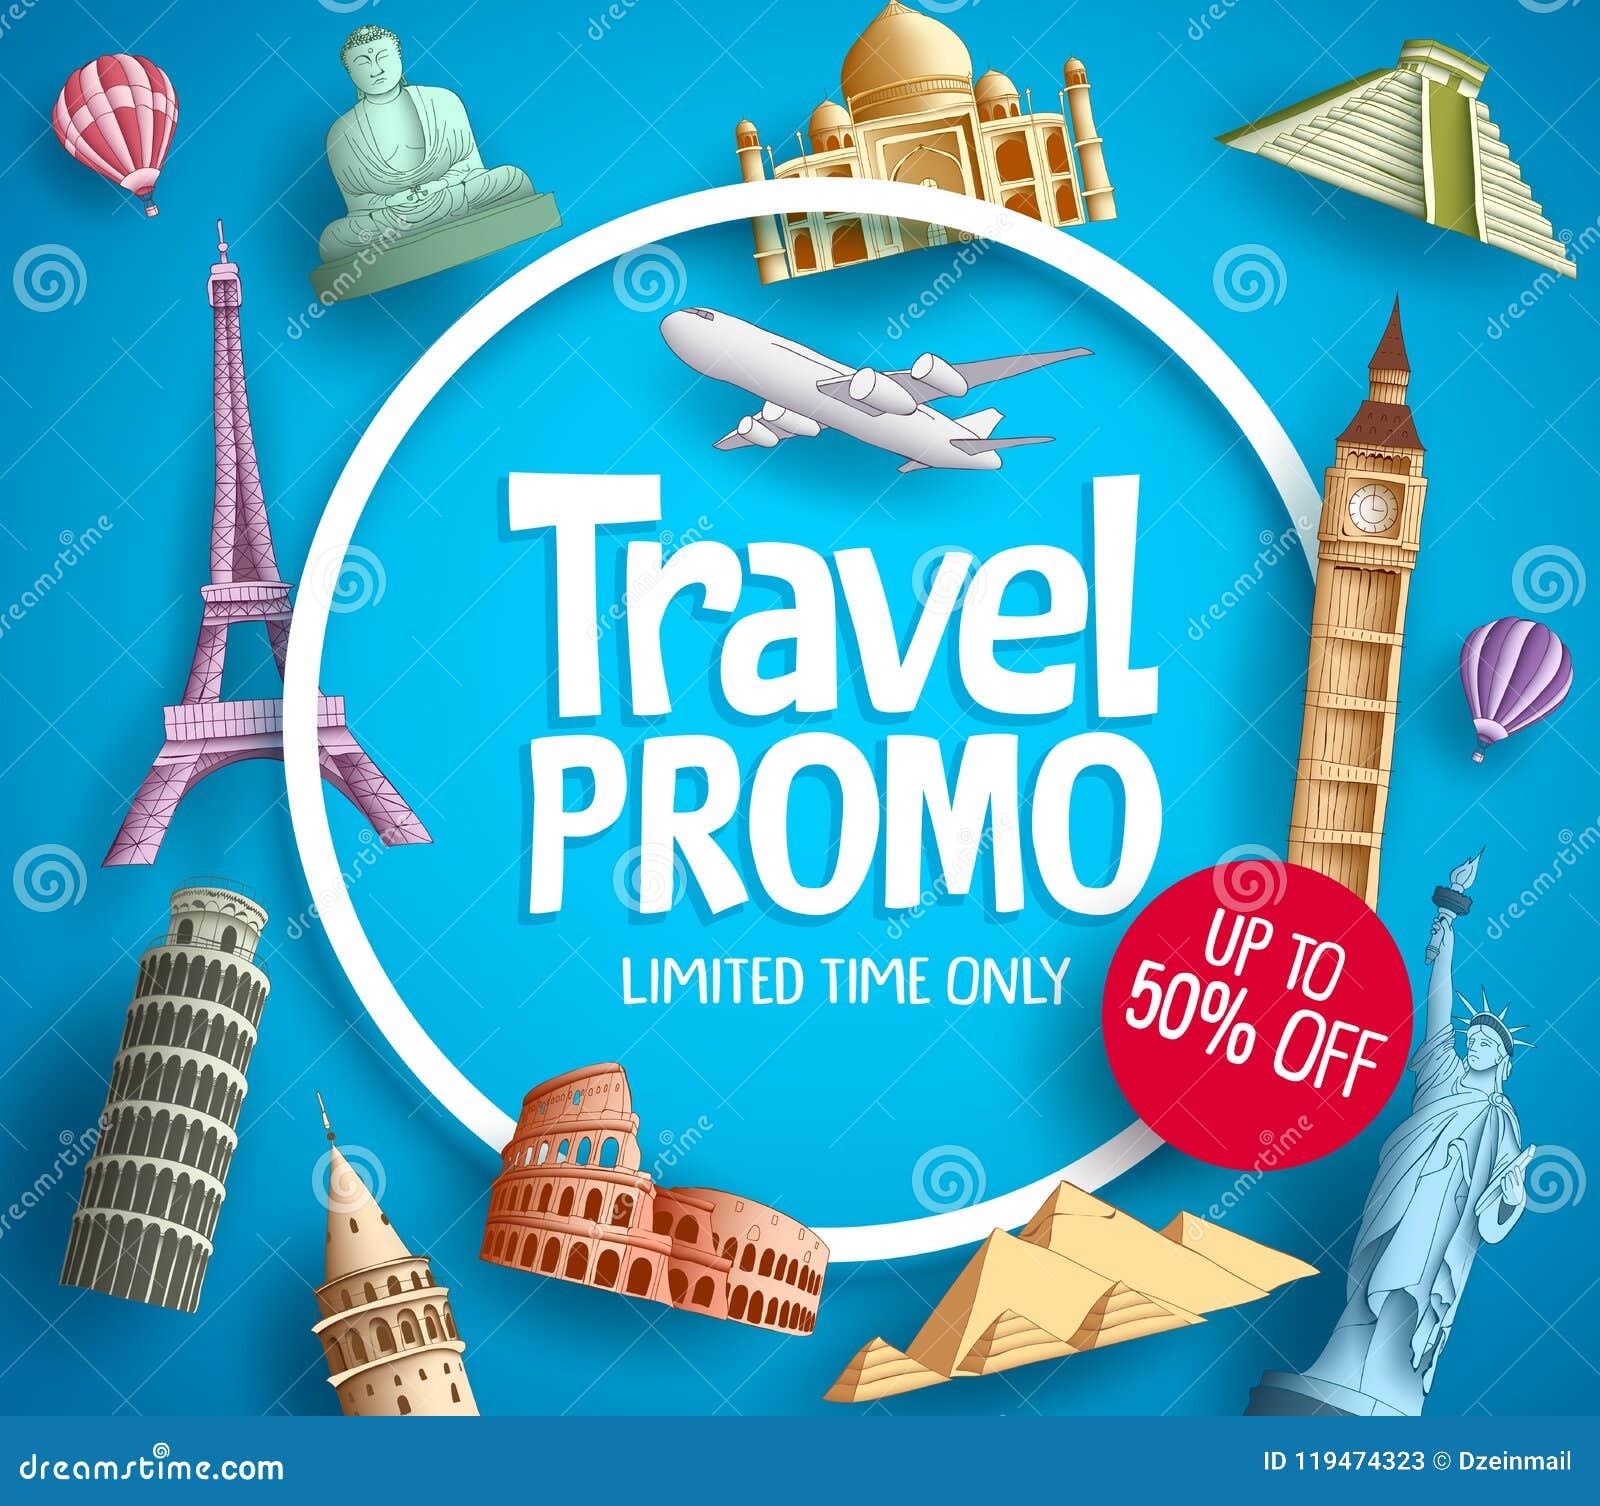 Travel promo vector banner promotion design with tourist destinations